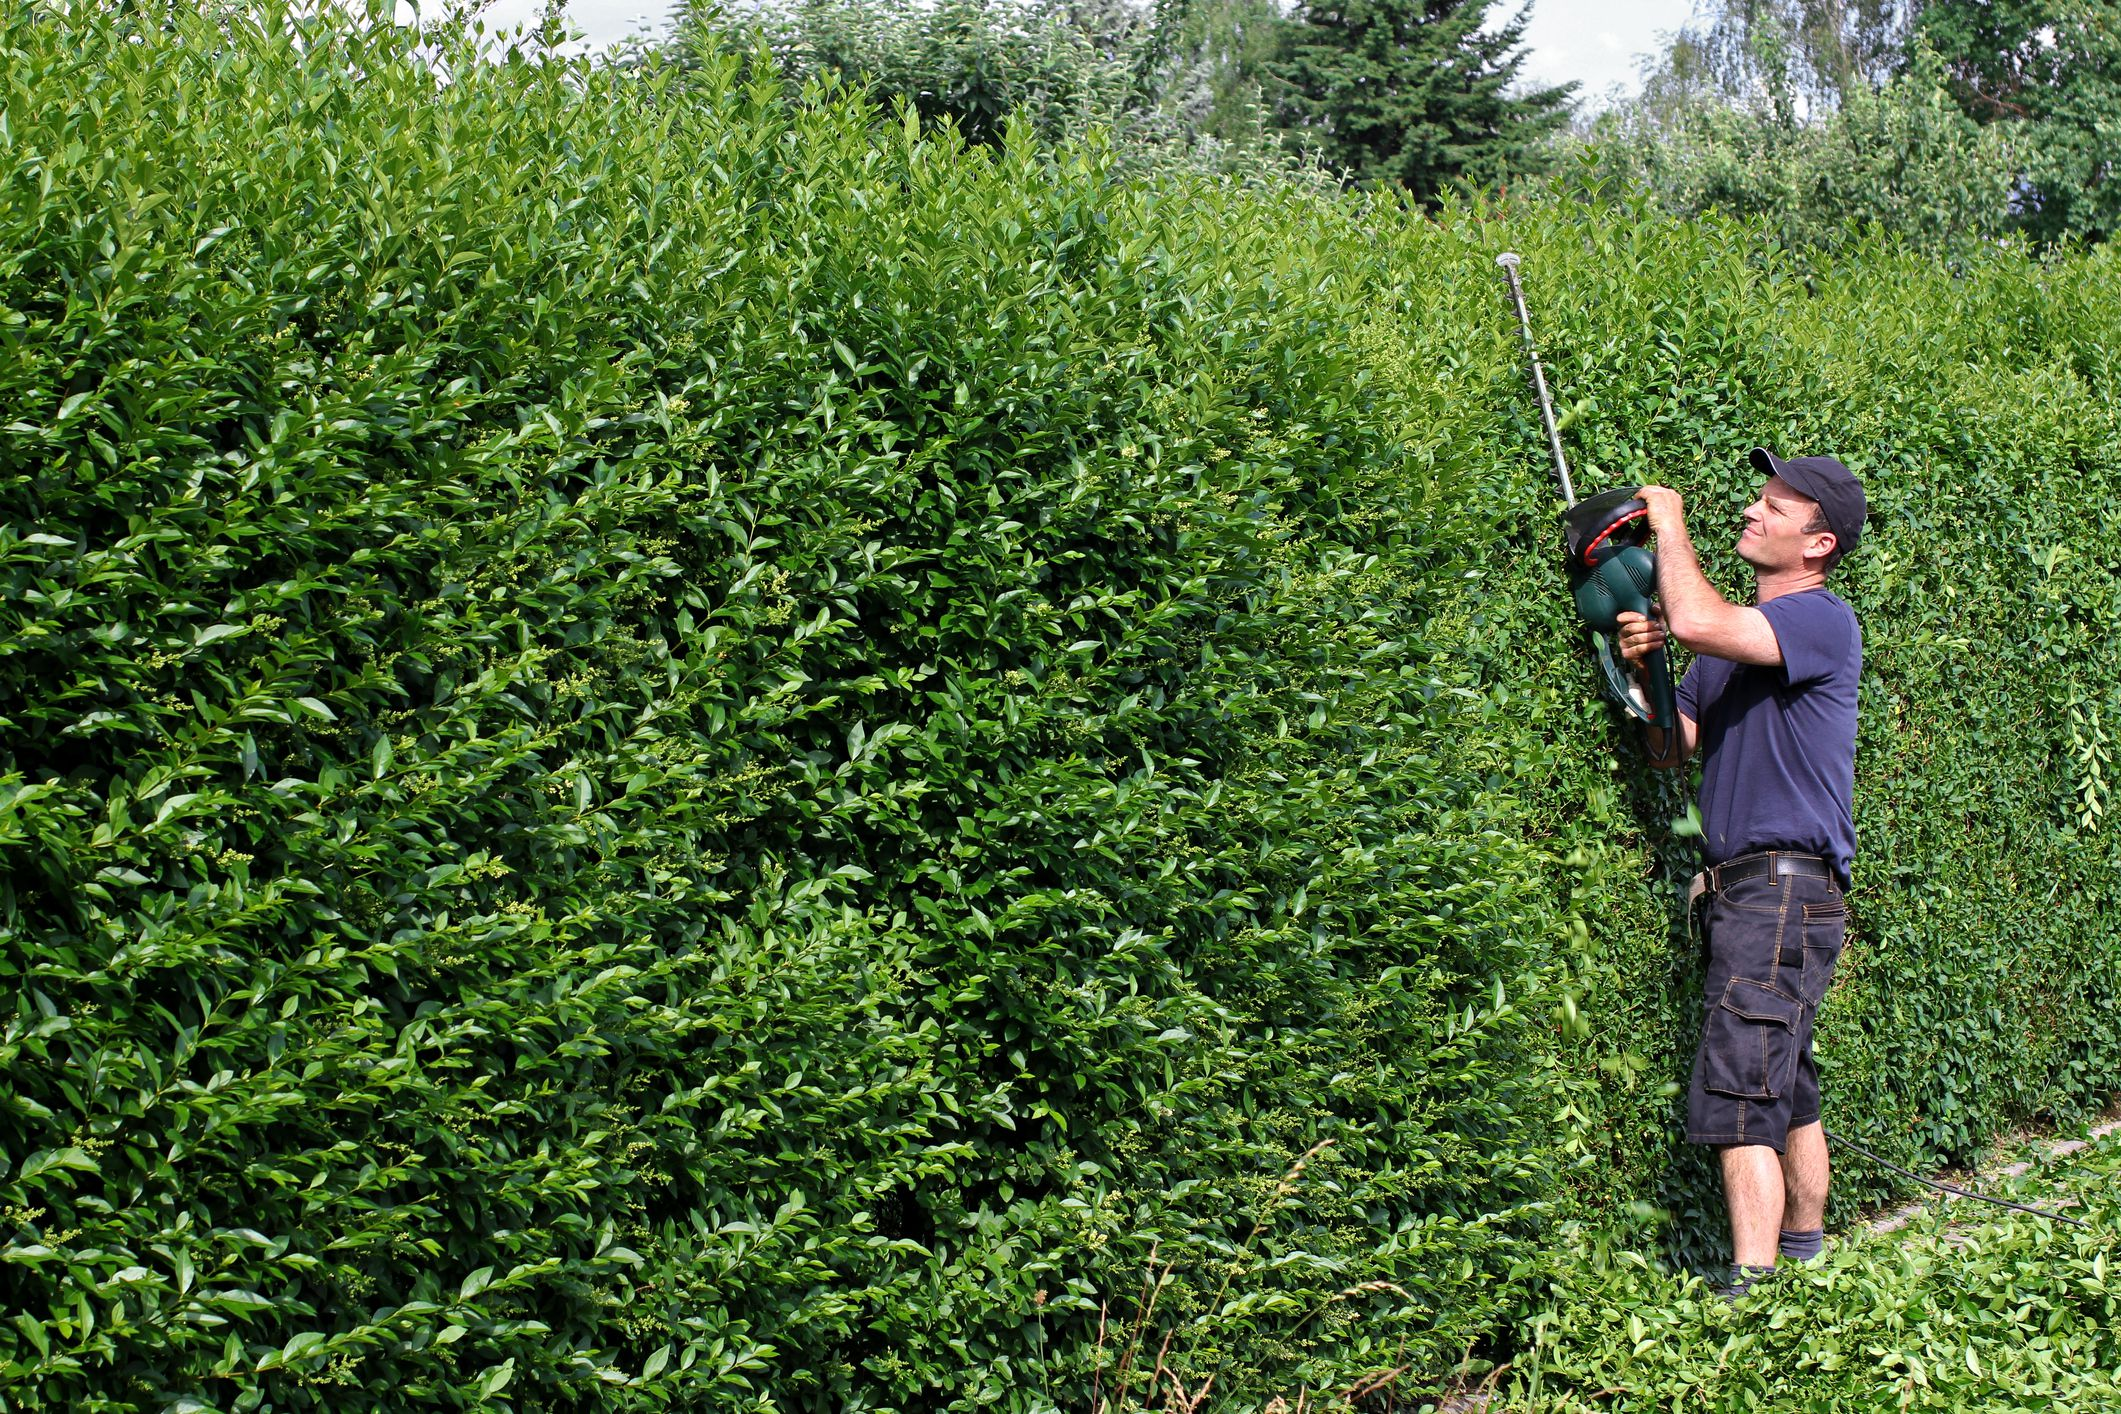 Man trimming privet hedge.